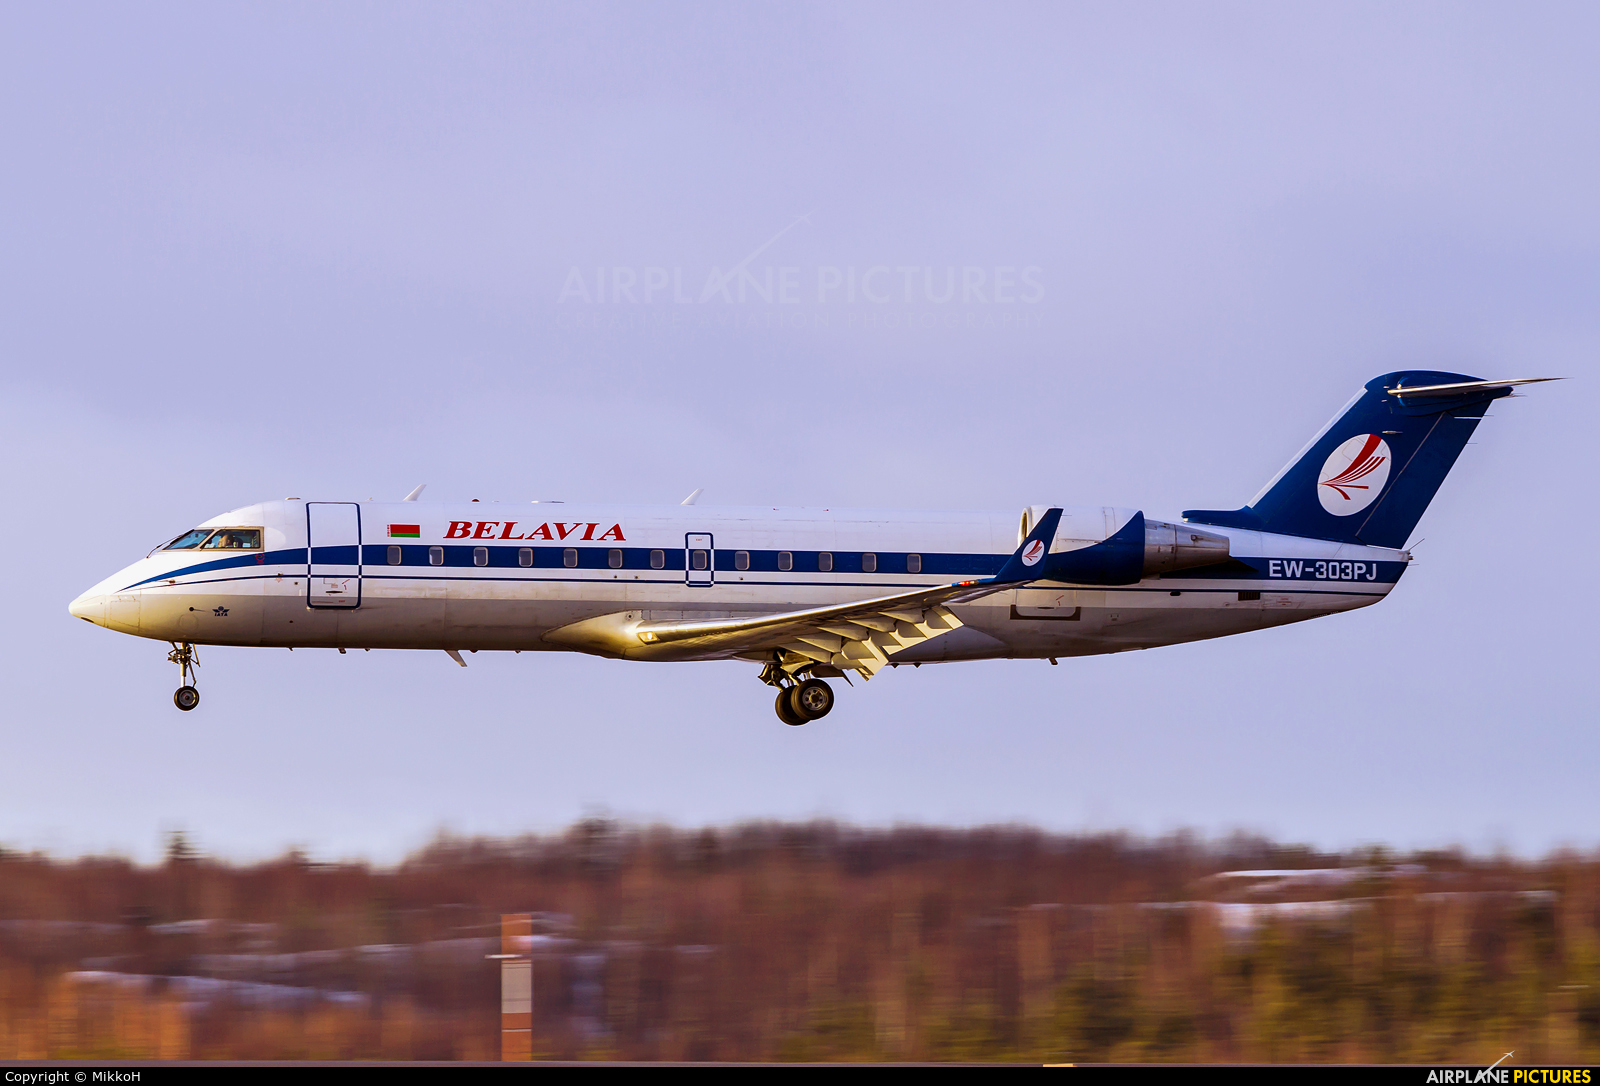 Belavia EW-303PJ aircraft at Helsinki - Vantaa